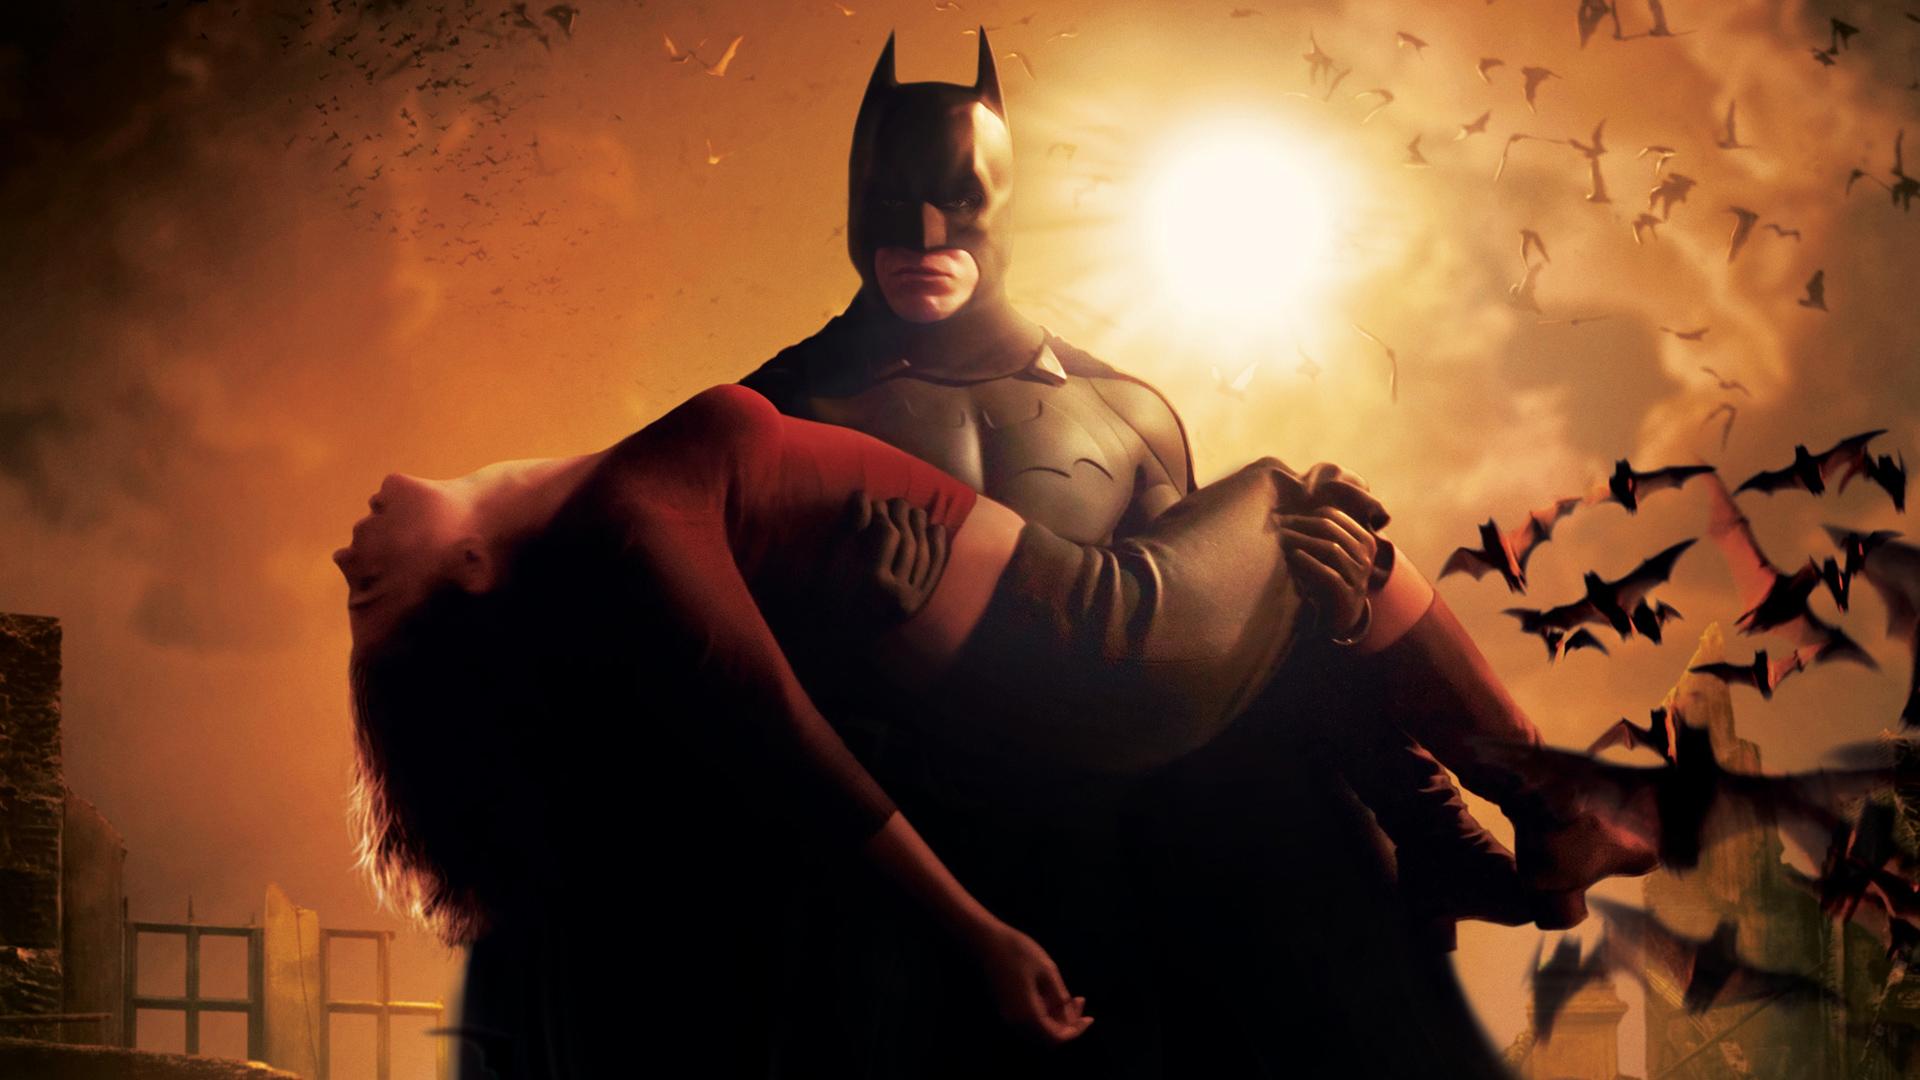 batman begins 1080p stream